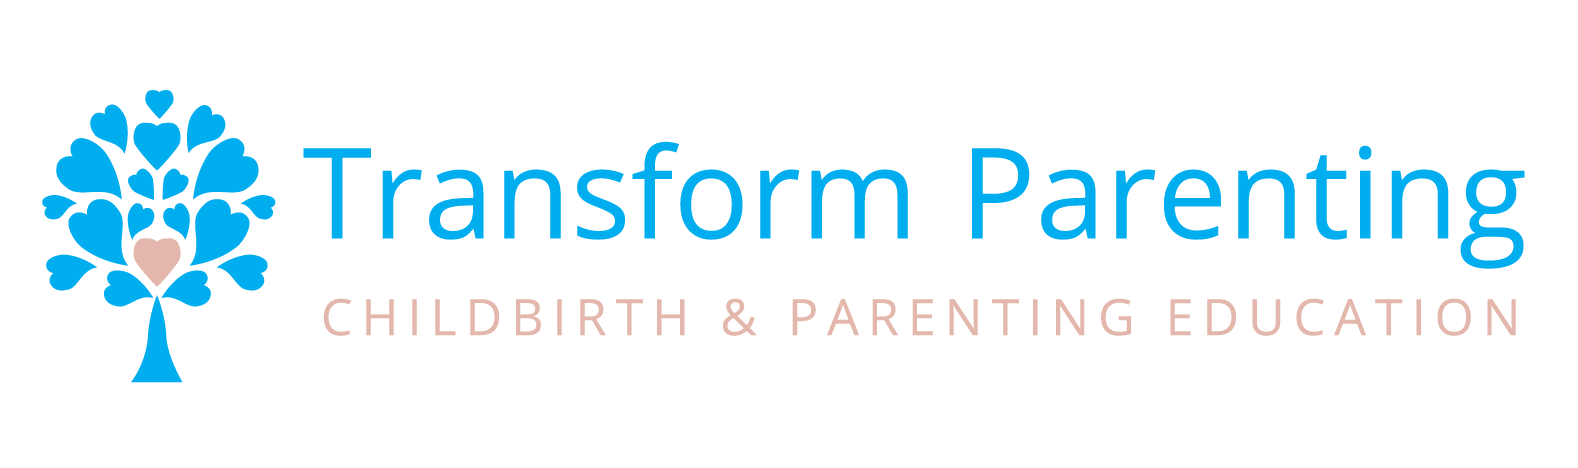 Transform Parenting